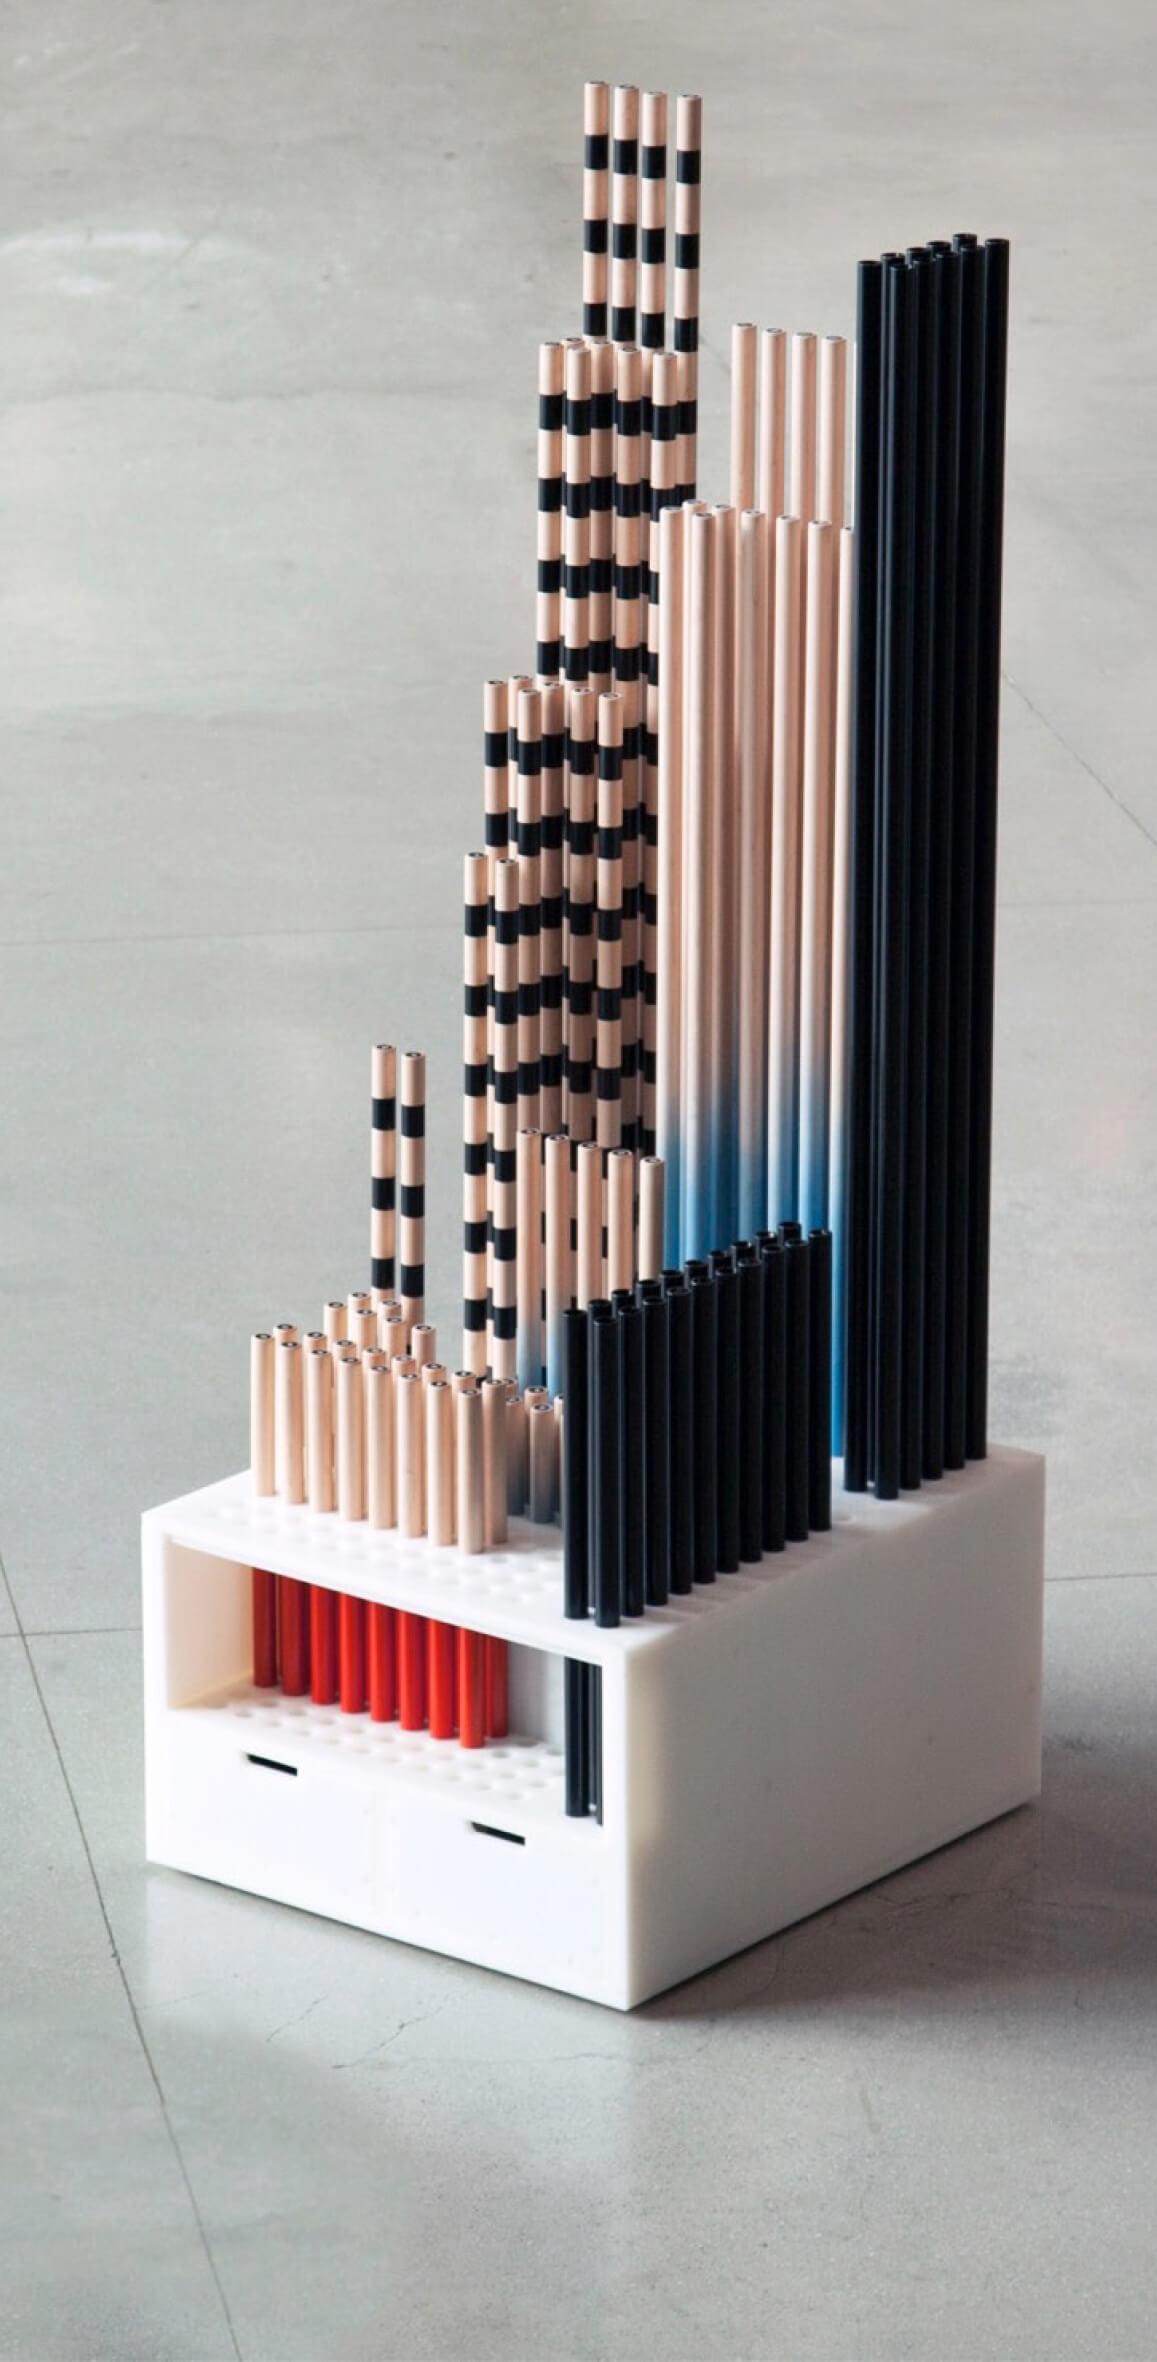 fabrique-trilogiq-pompidou-creation-design-fablab-mobilier-OKTO-_03